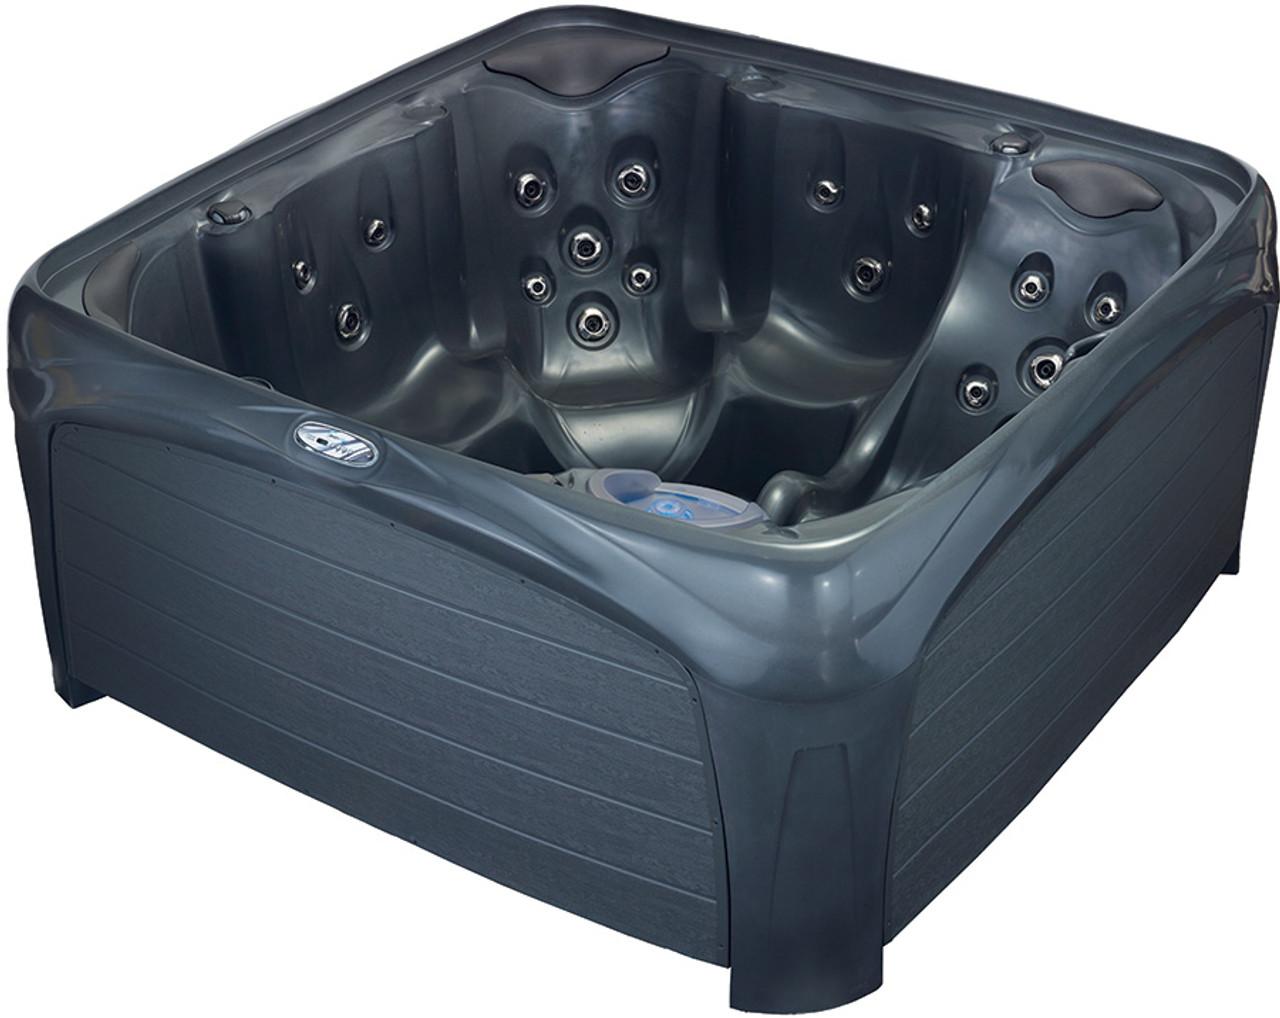 Crossover 730L Hot Tub - Metallic Gray & Gray